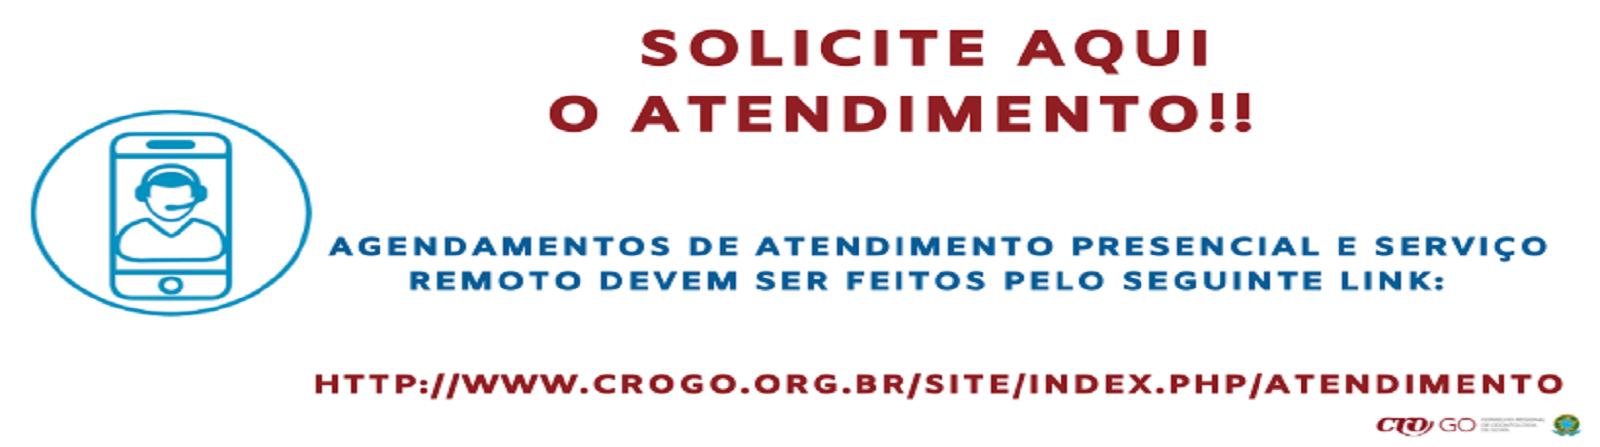 Atendimento_presencial_e_servio_remoto_via_link_-_1600_x_447